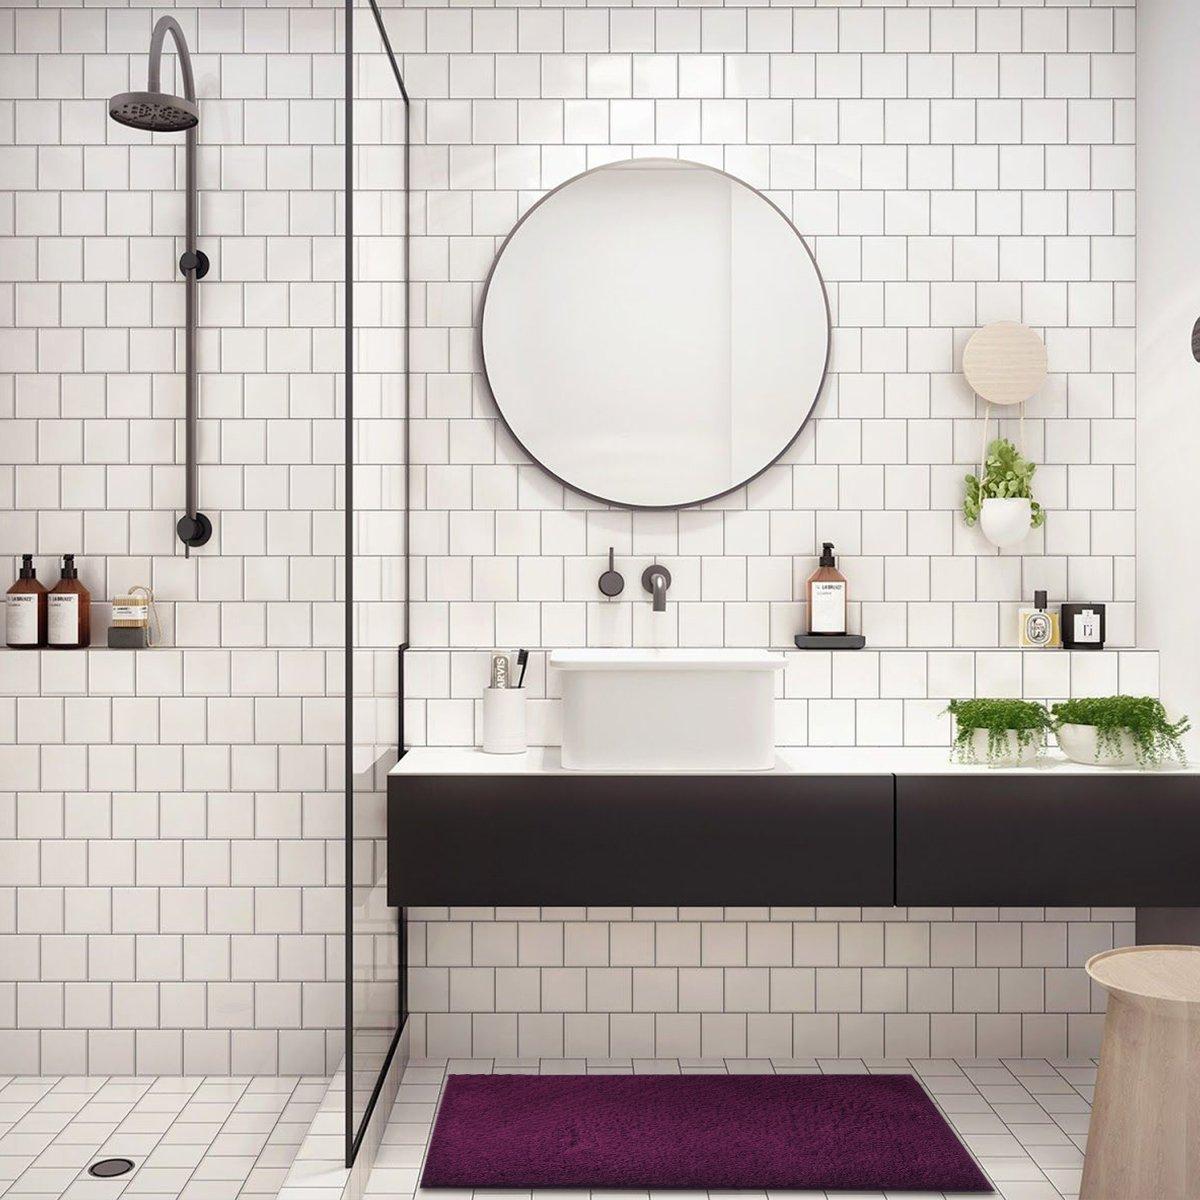 Amazon.com: Mayshine Soft Bathroom Rugs Shag Absorbent Bath Mat Non ...